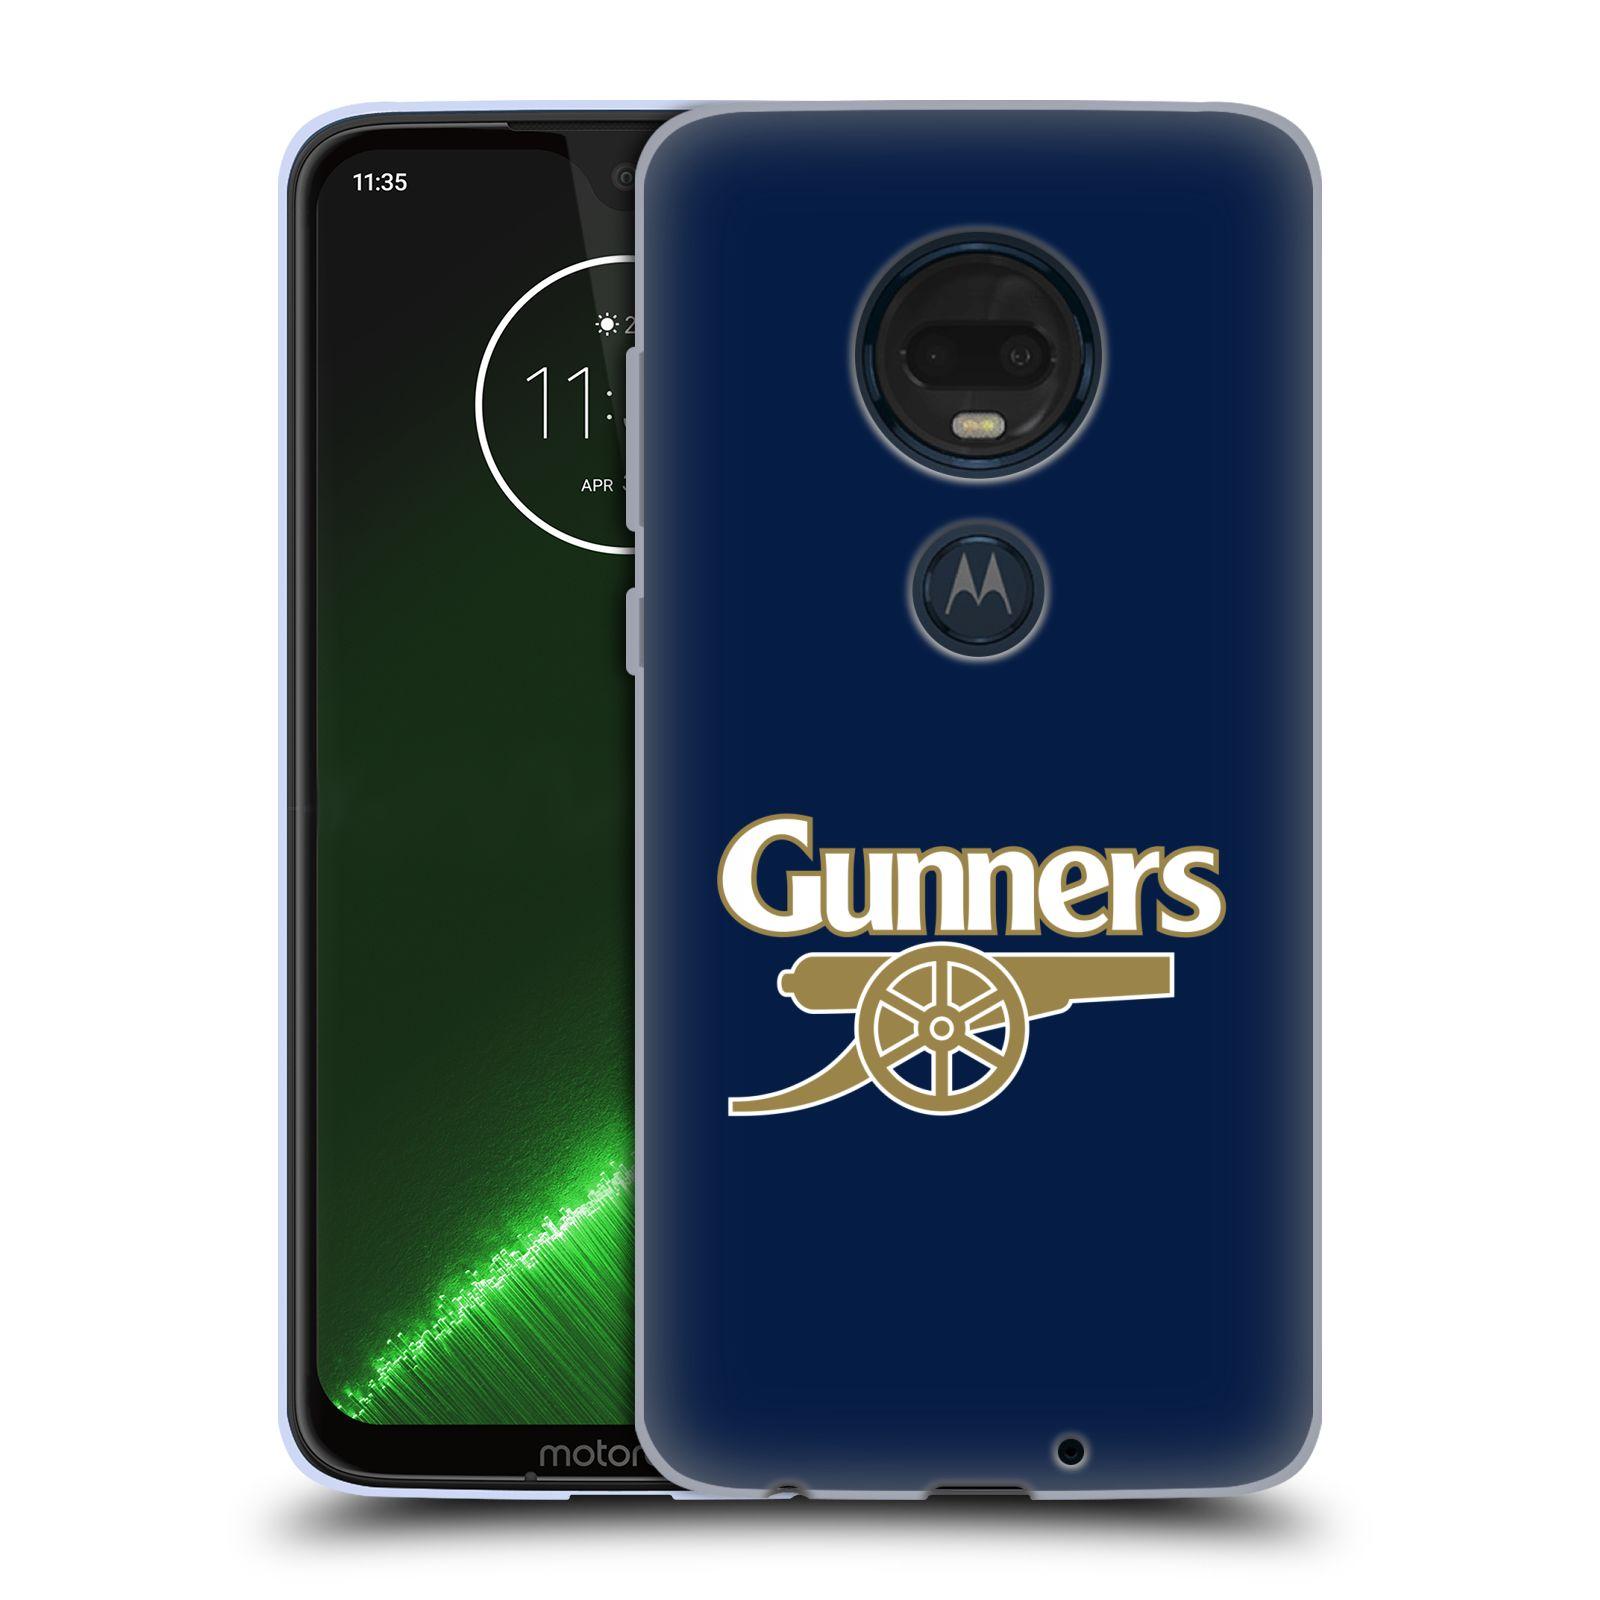 Silikonové pouzdro na mobil Motorola Moto G7 Plus - Head Case - Arsenal FC - Gunners